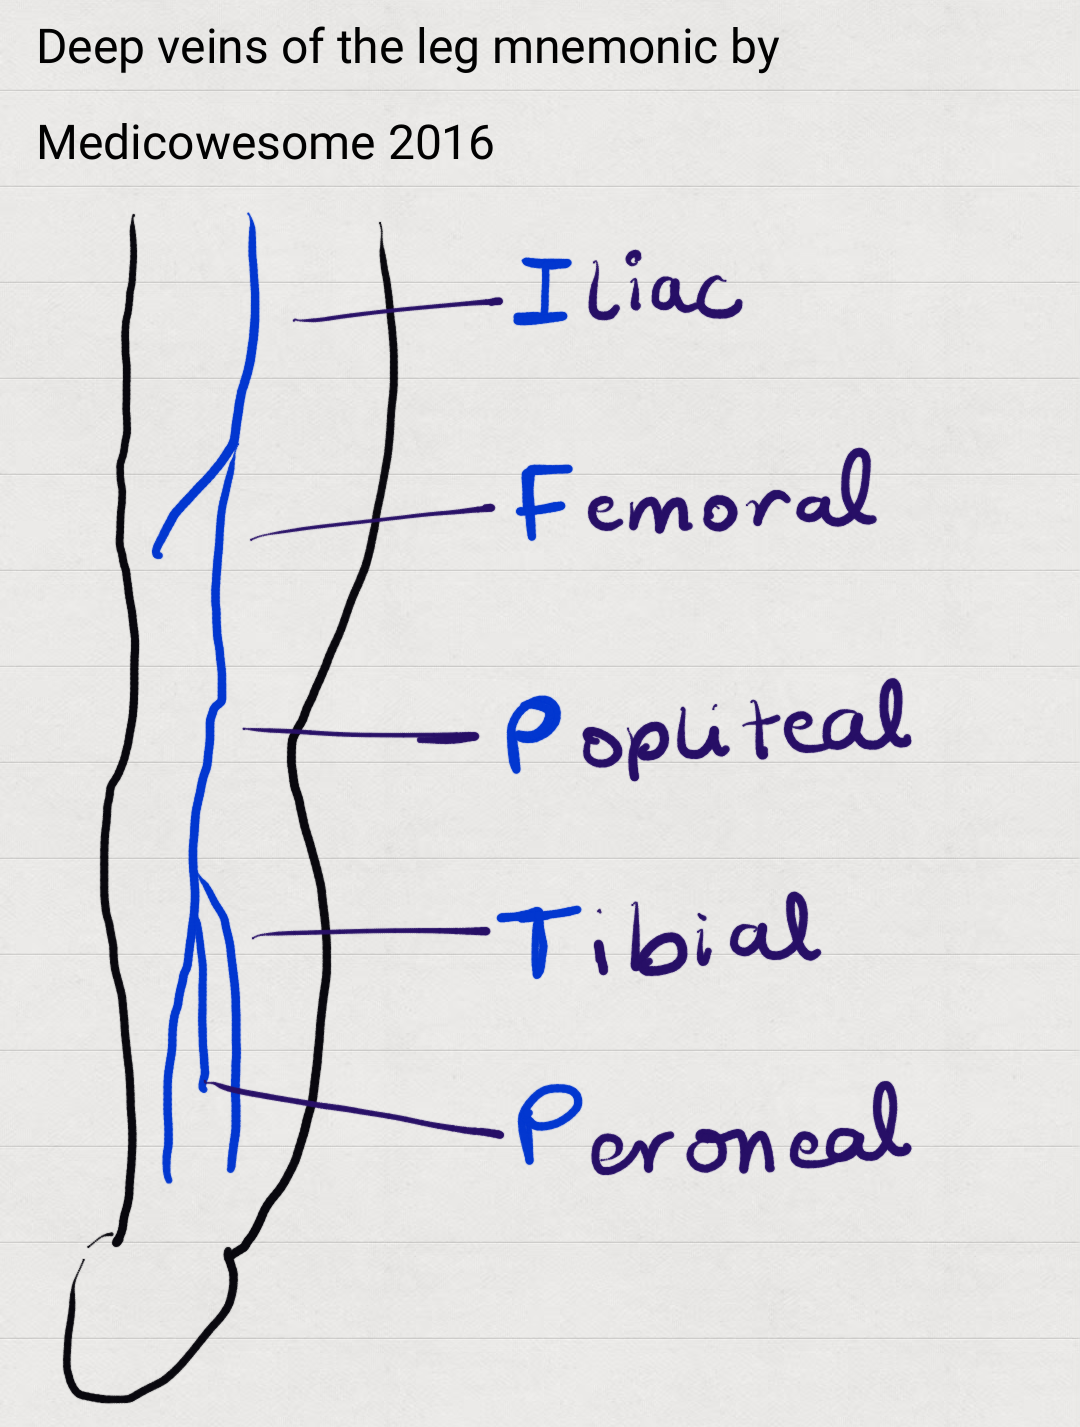 Deep veins of the leg anatomy